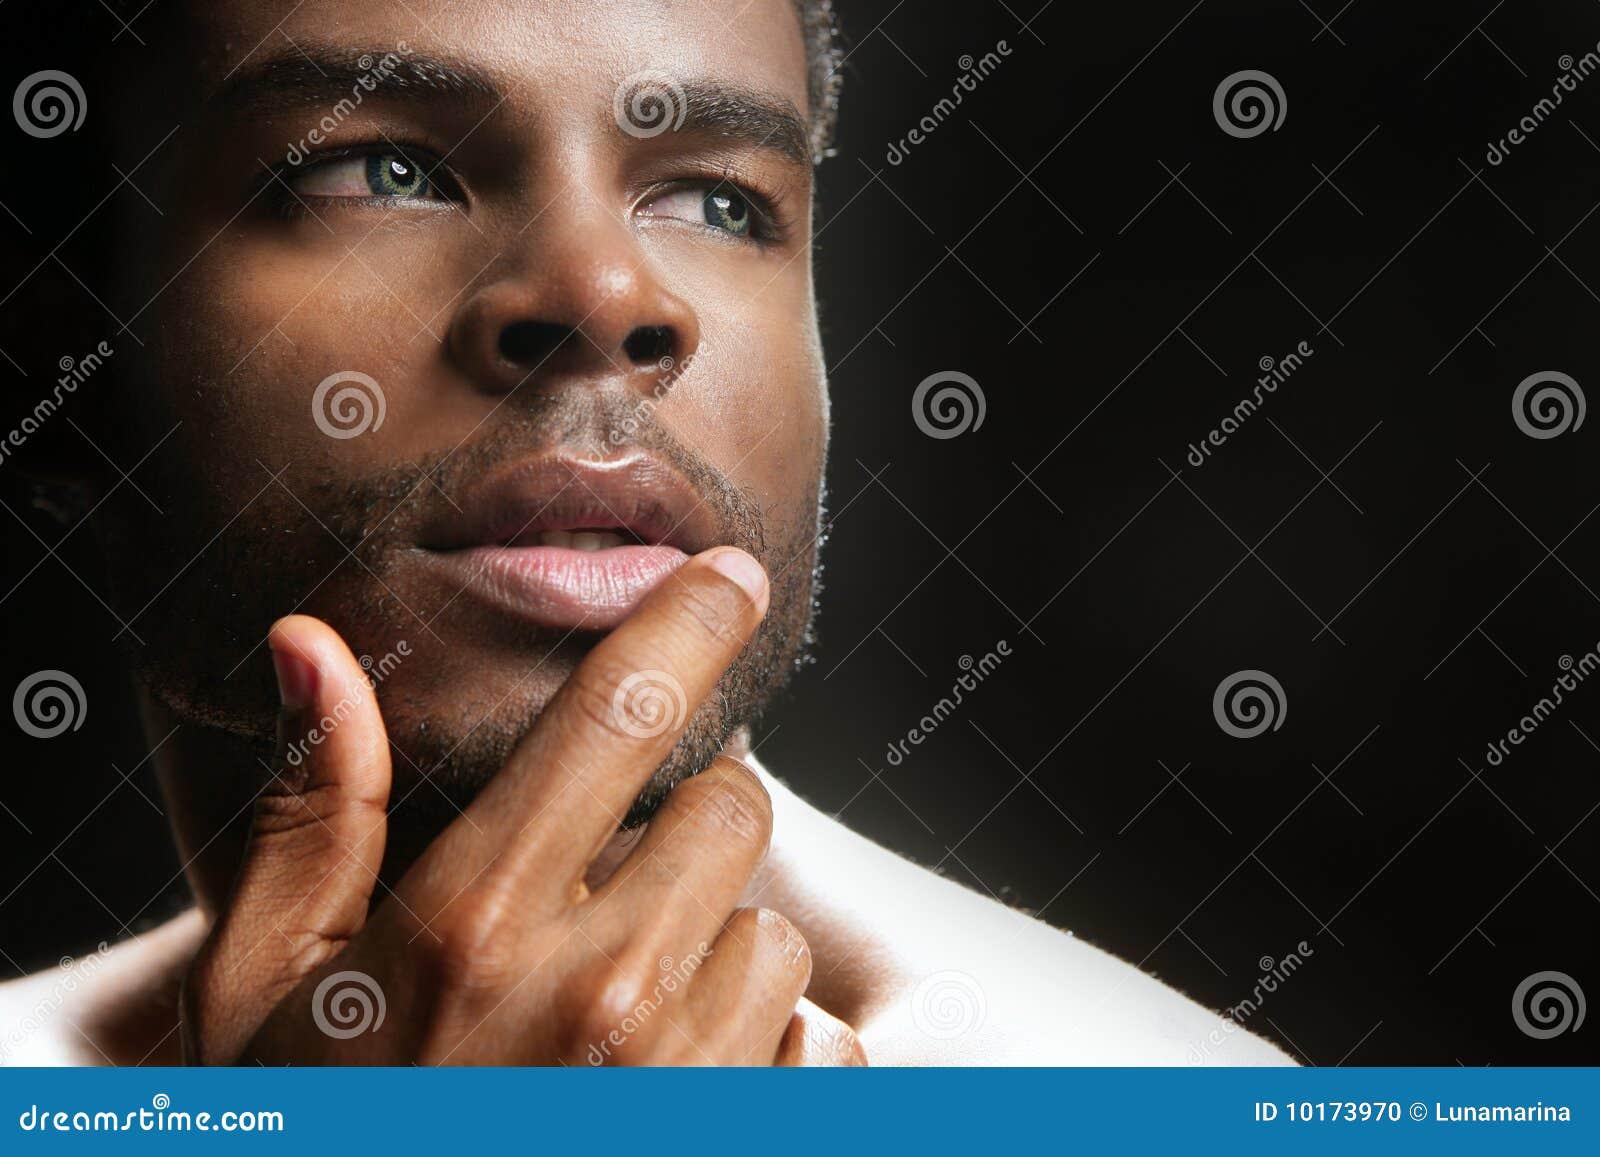 retrato-preto-bonito-do-homem-novo-de-americano-africano-10173970.jpg